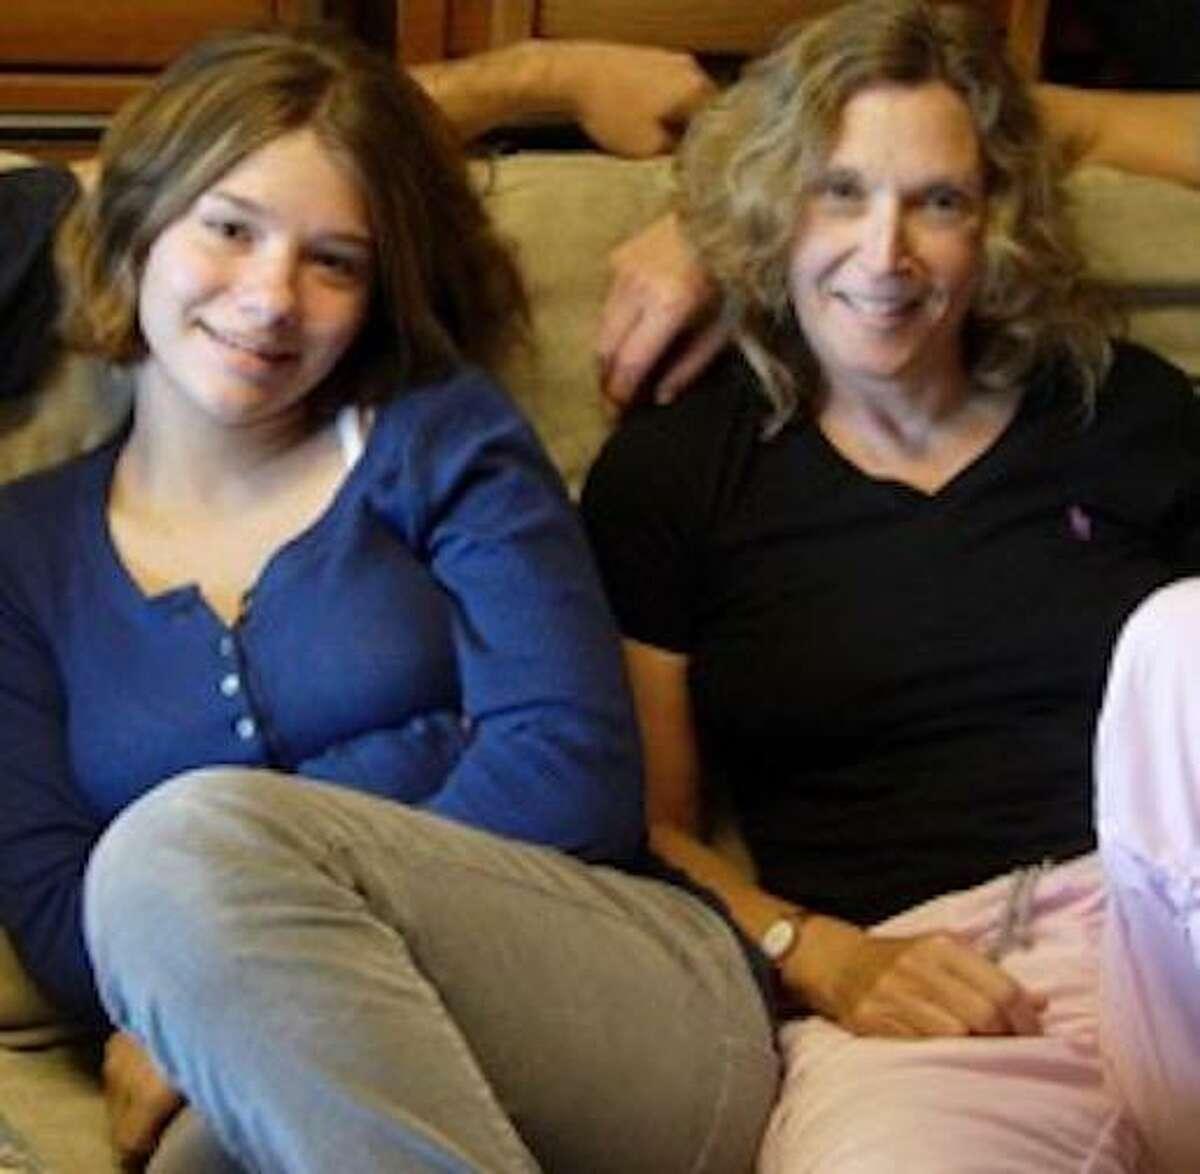 Alexa and her mom, Debbie Berman.